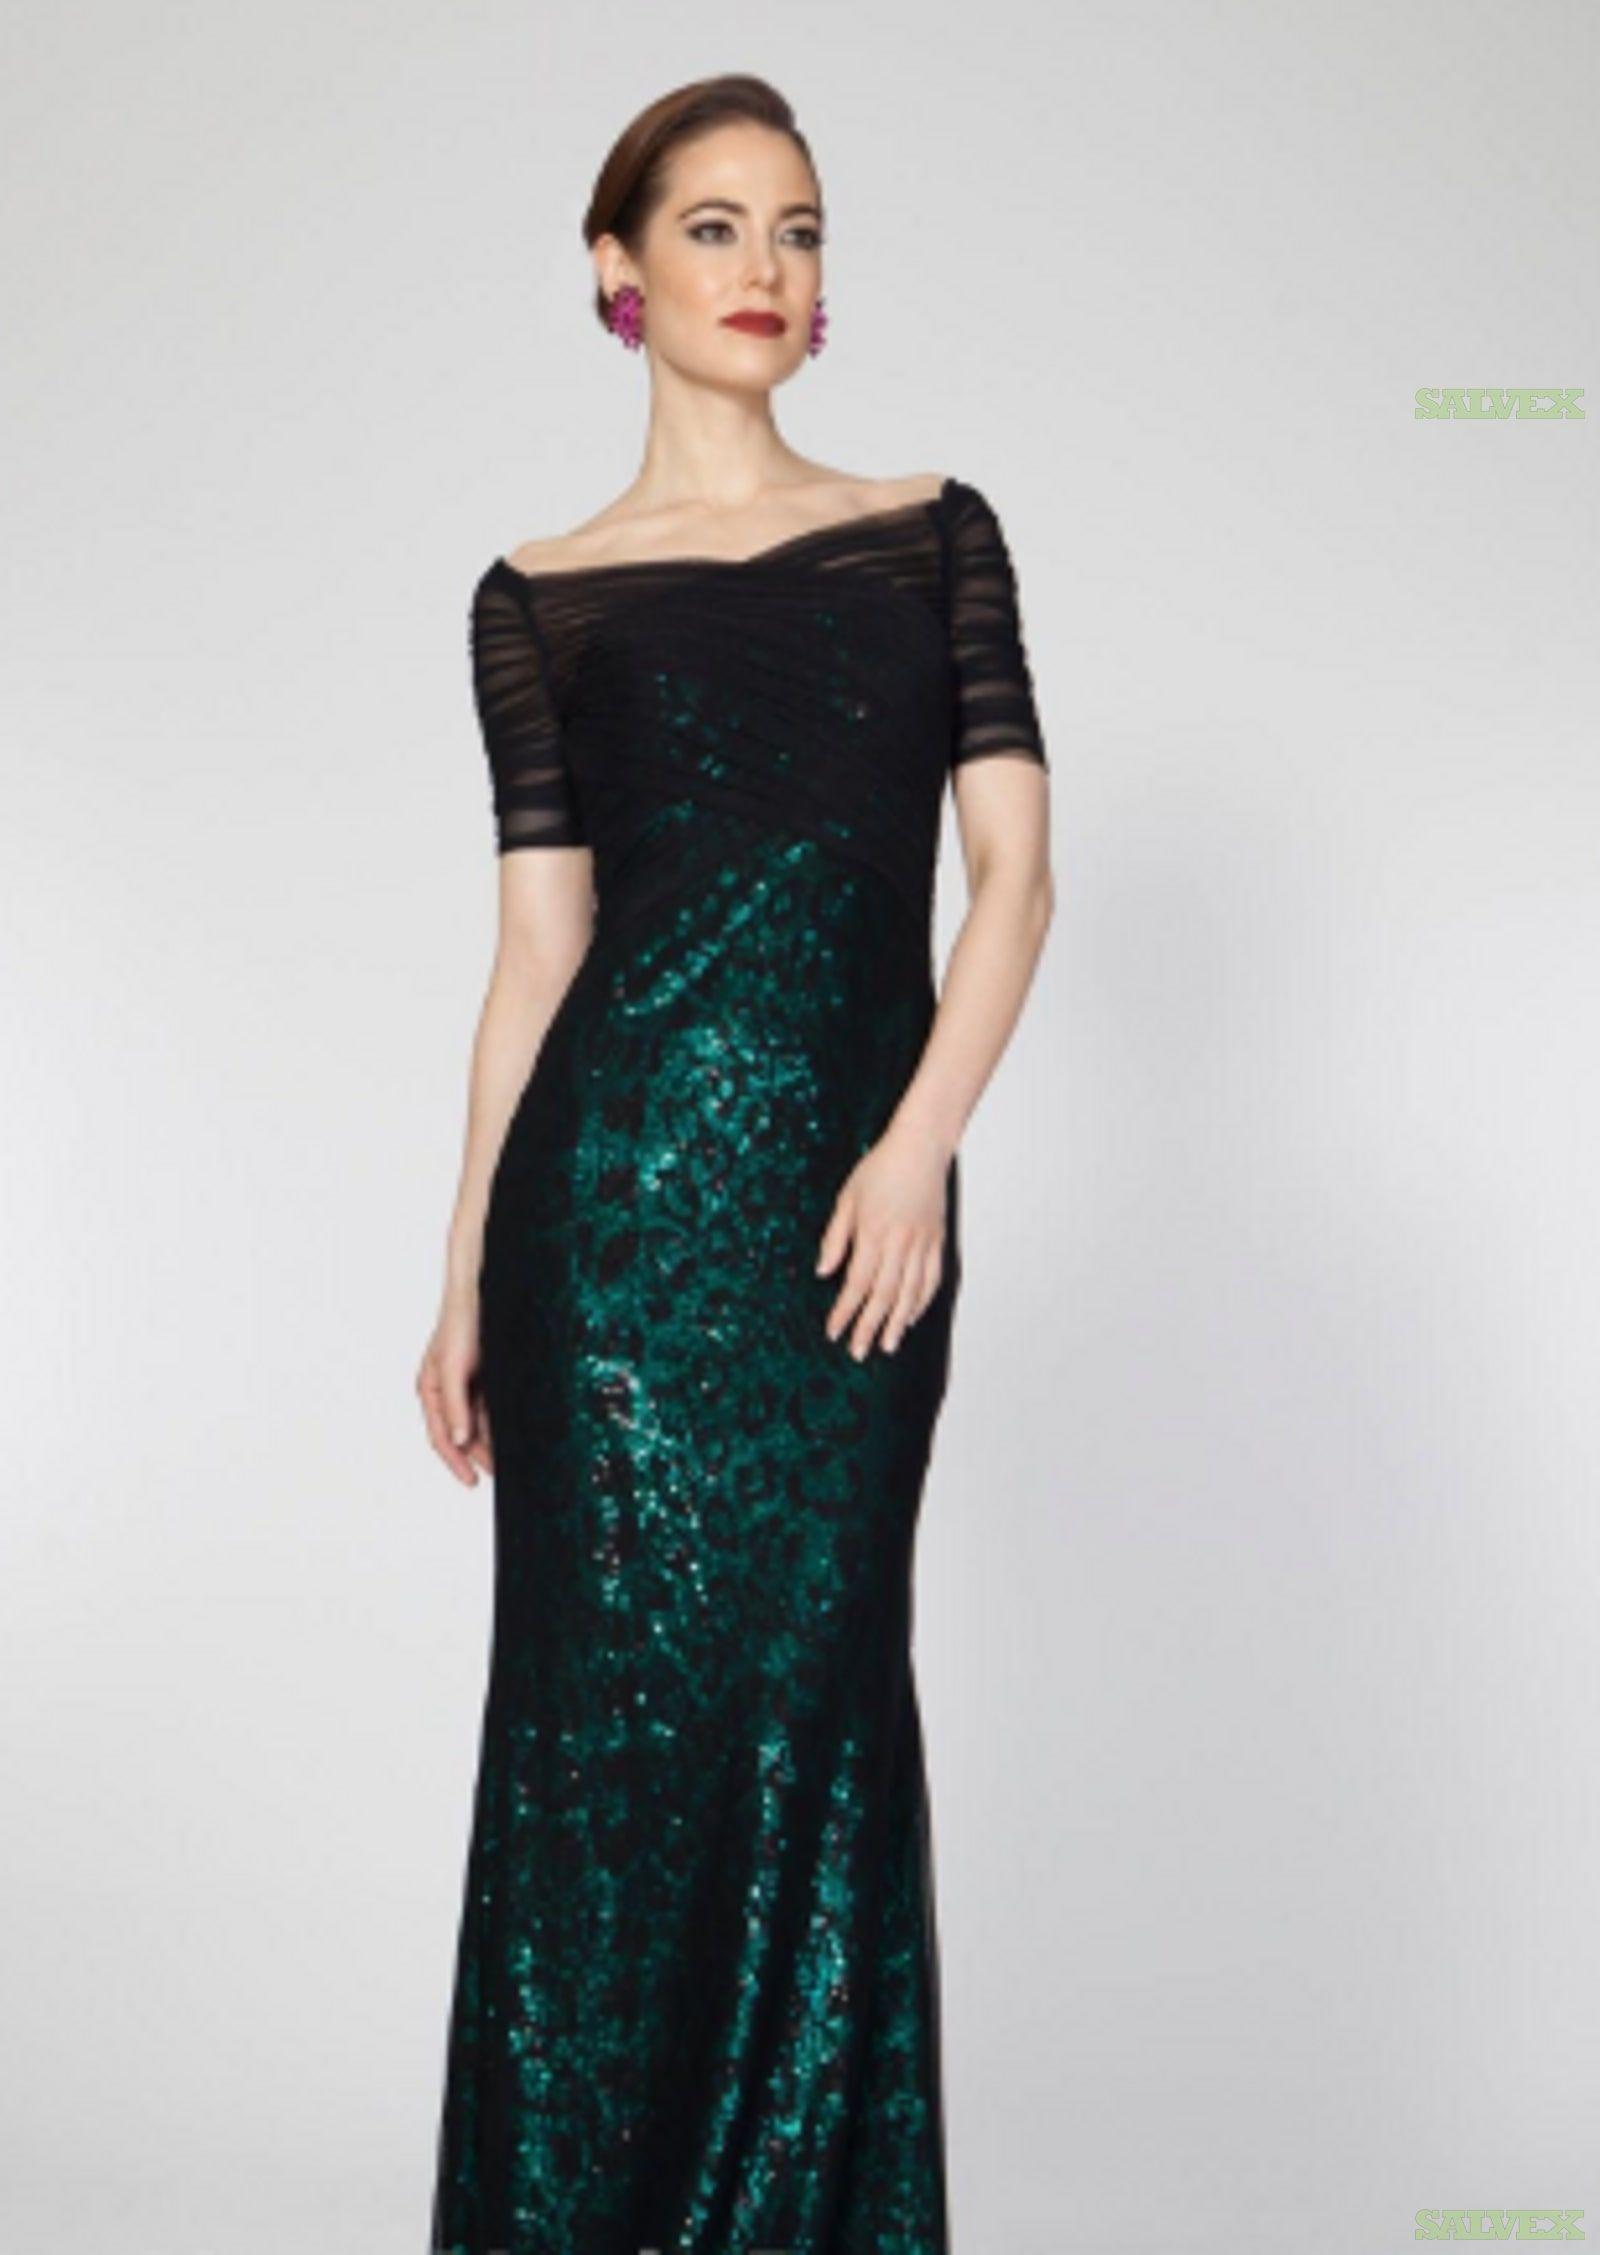 Designer Party Dresses (Marchesa, Badgley Mischka, Theia, Etc.) - 861 Dresses